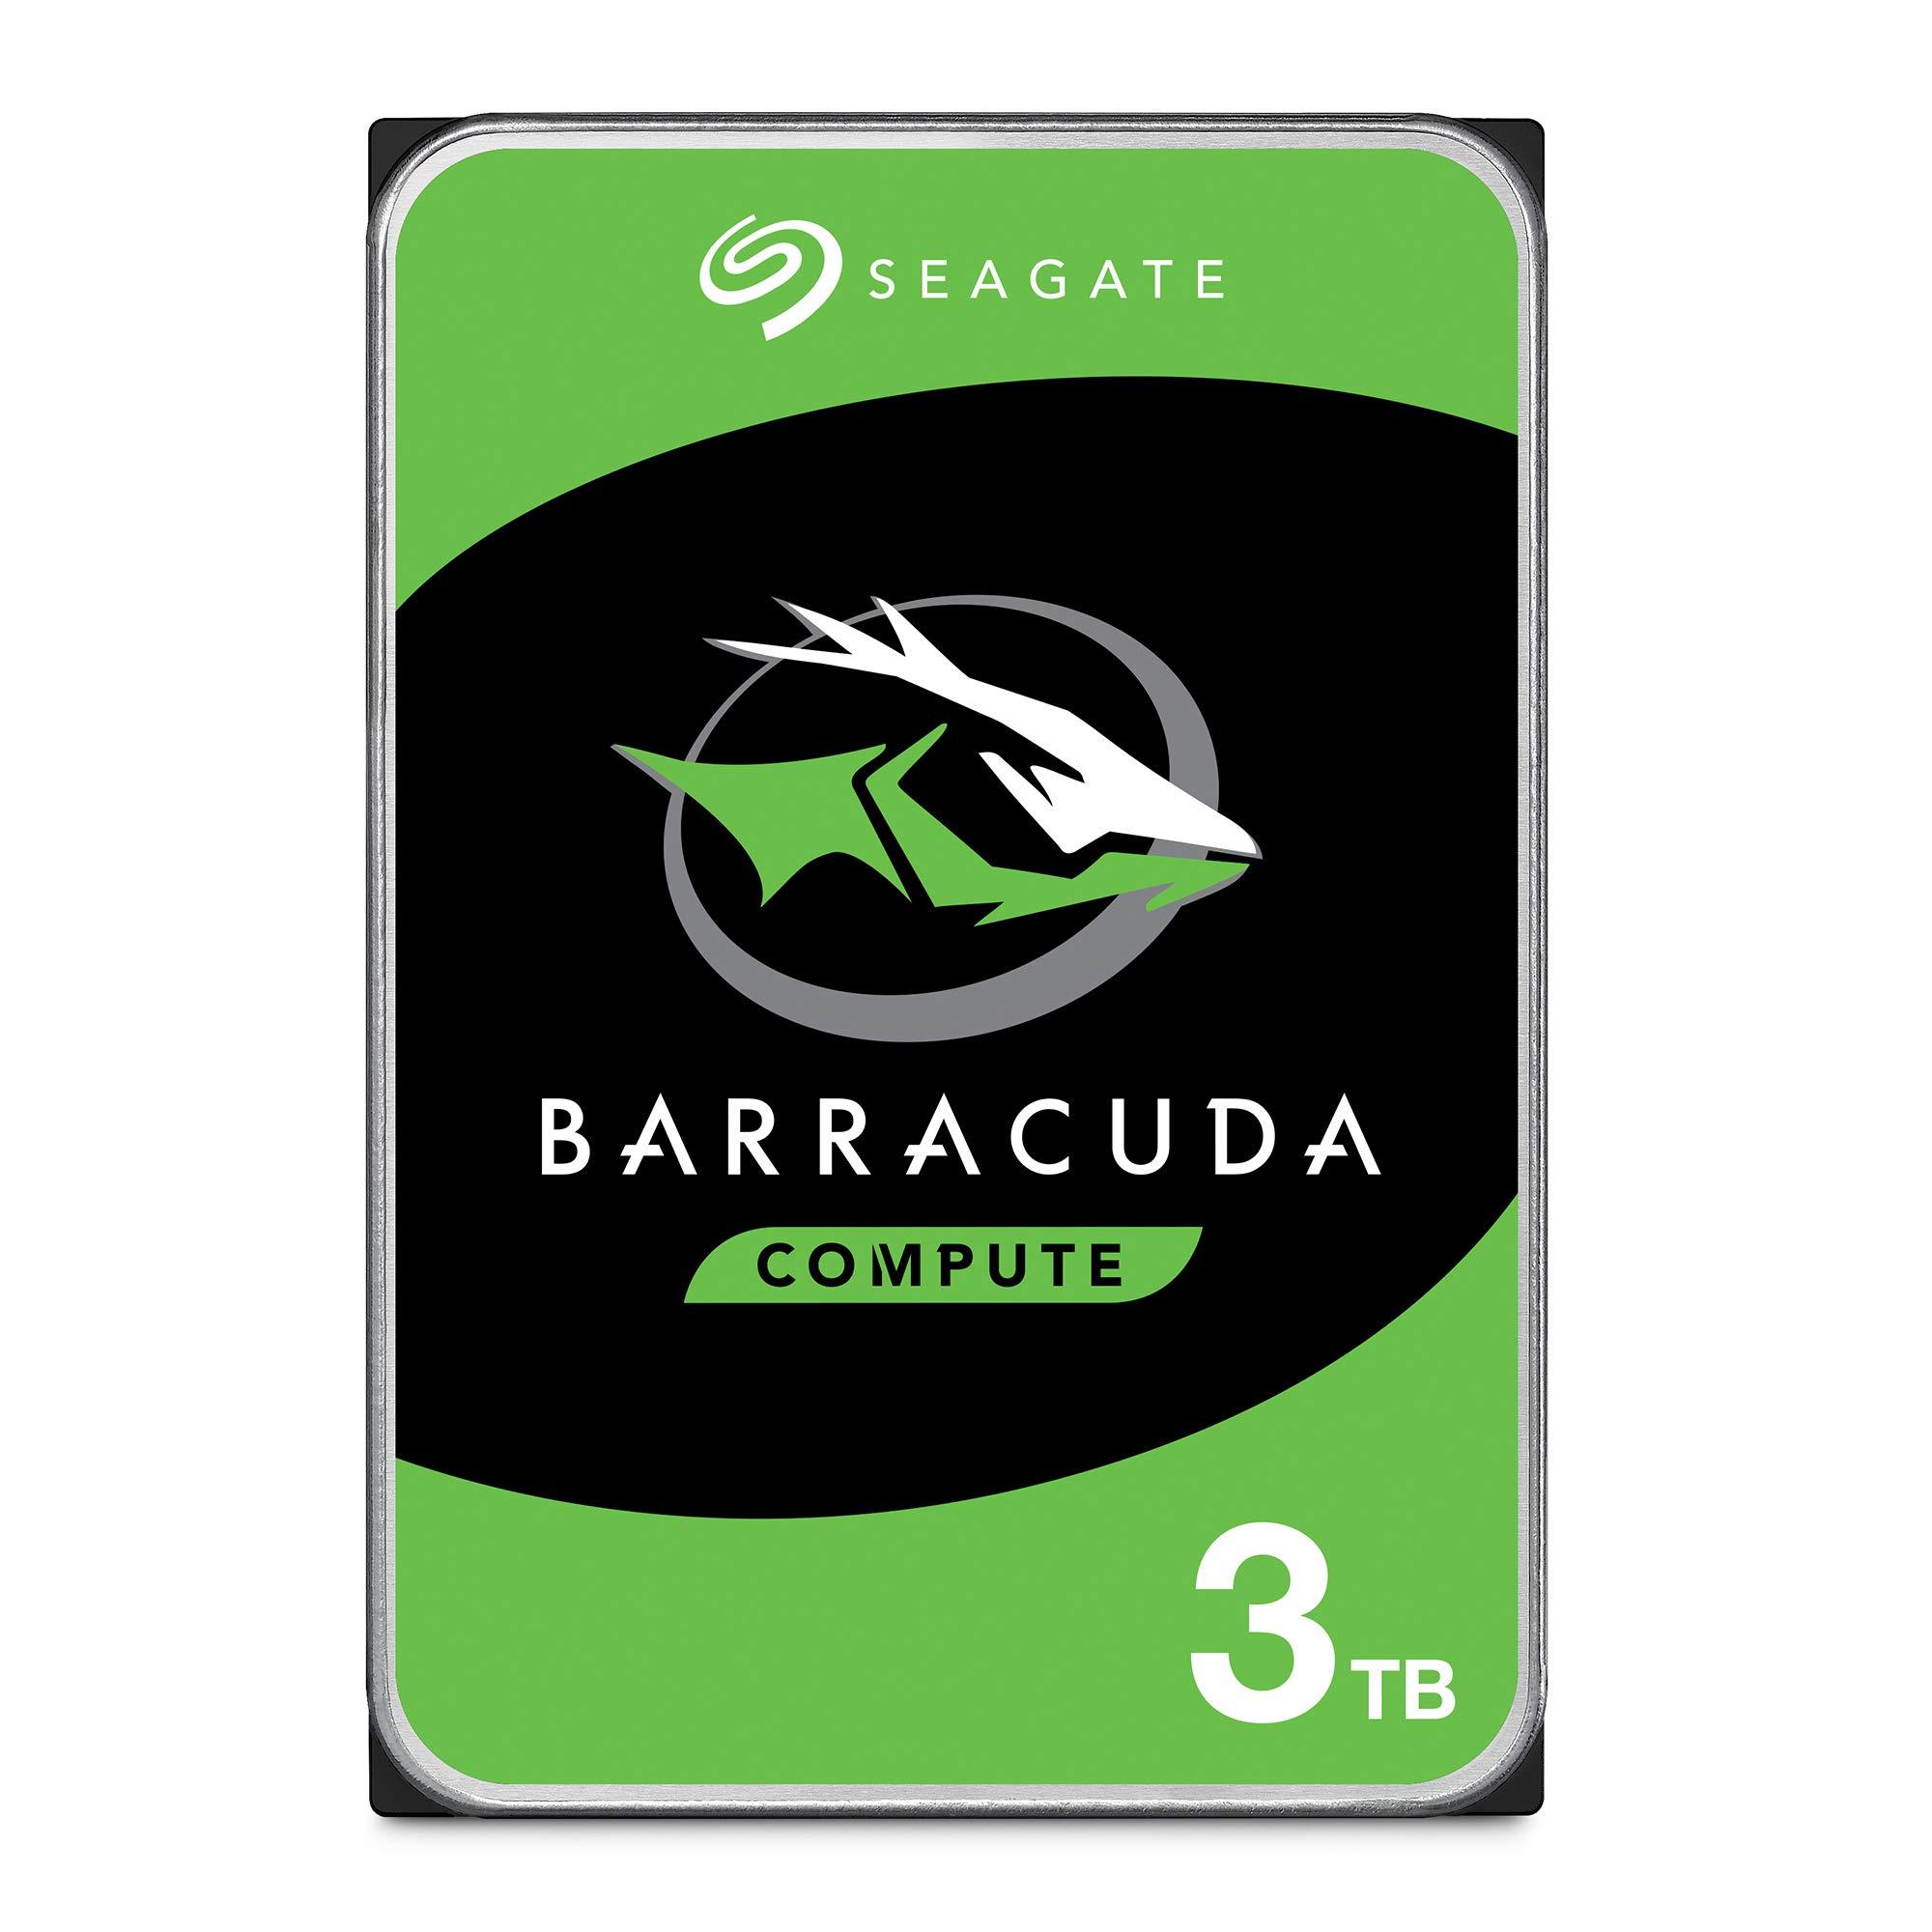 Seagate BarraCuda 1TB Internal Hard Drive HDD – 3.5 Inch SATA 6 Gb/s 7200 RPM 64MB Cache for Computer Desktop PC – Frustration Free Packaging (ST1000DM010) 3TB ST3000DMZ07/DM007